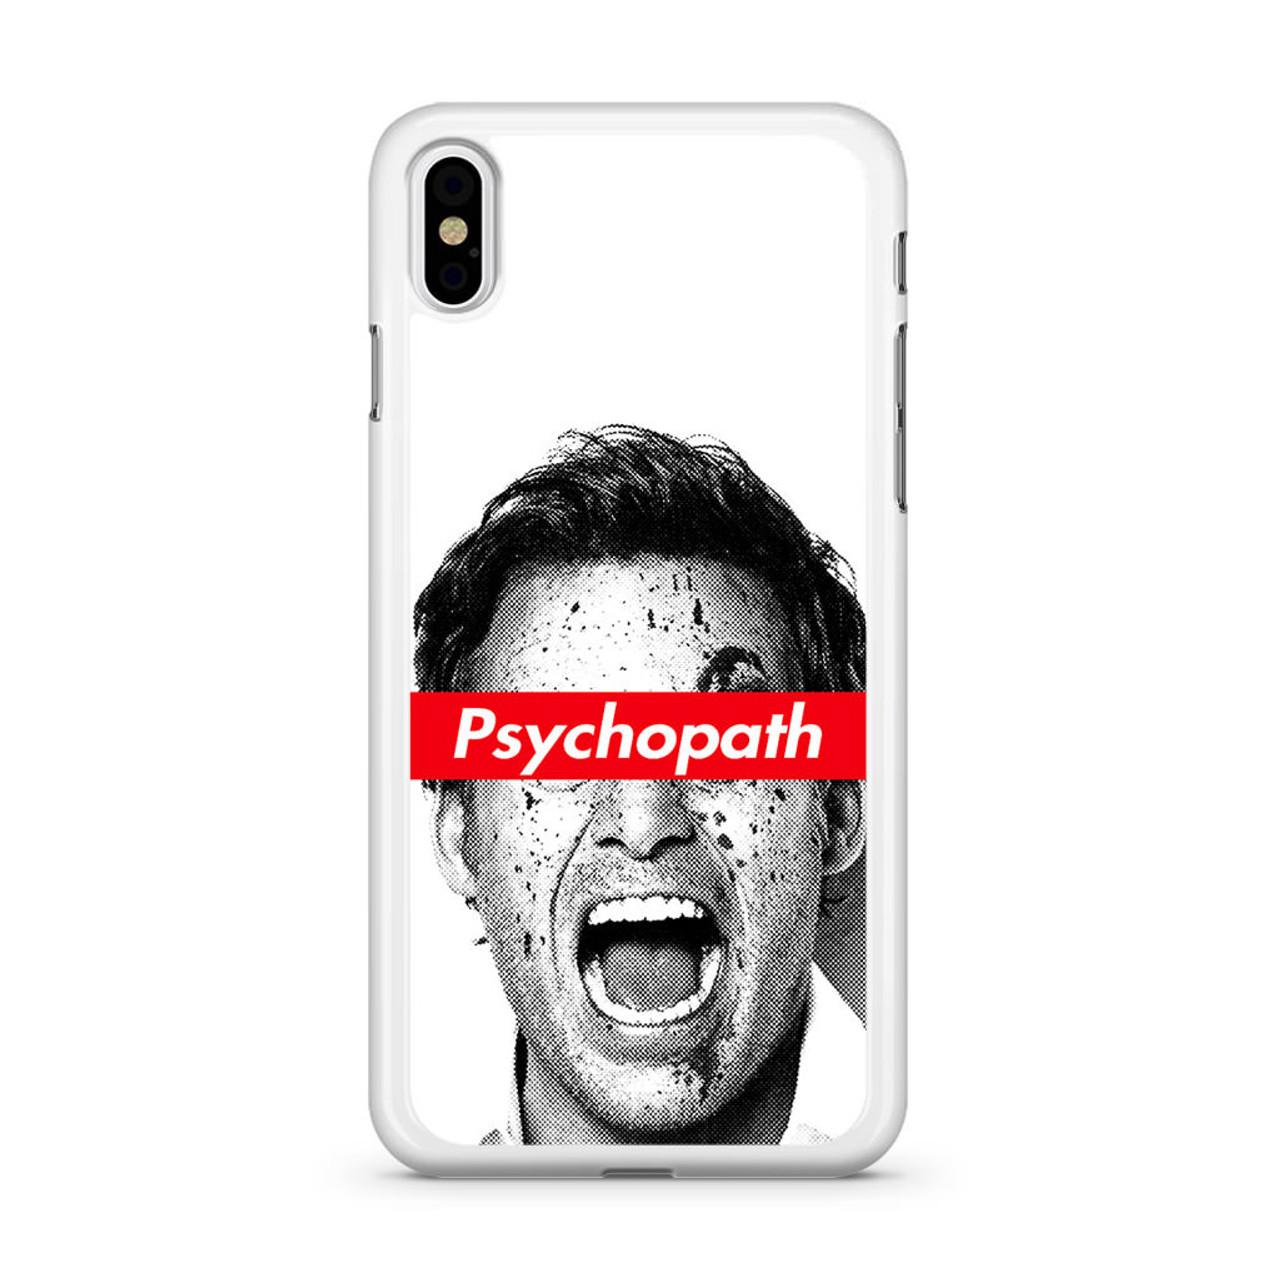 psycopath 2 iphone case